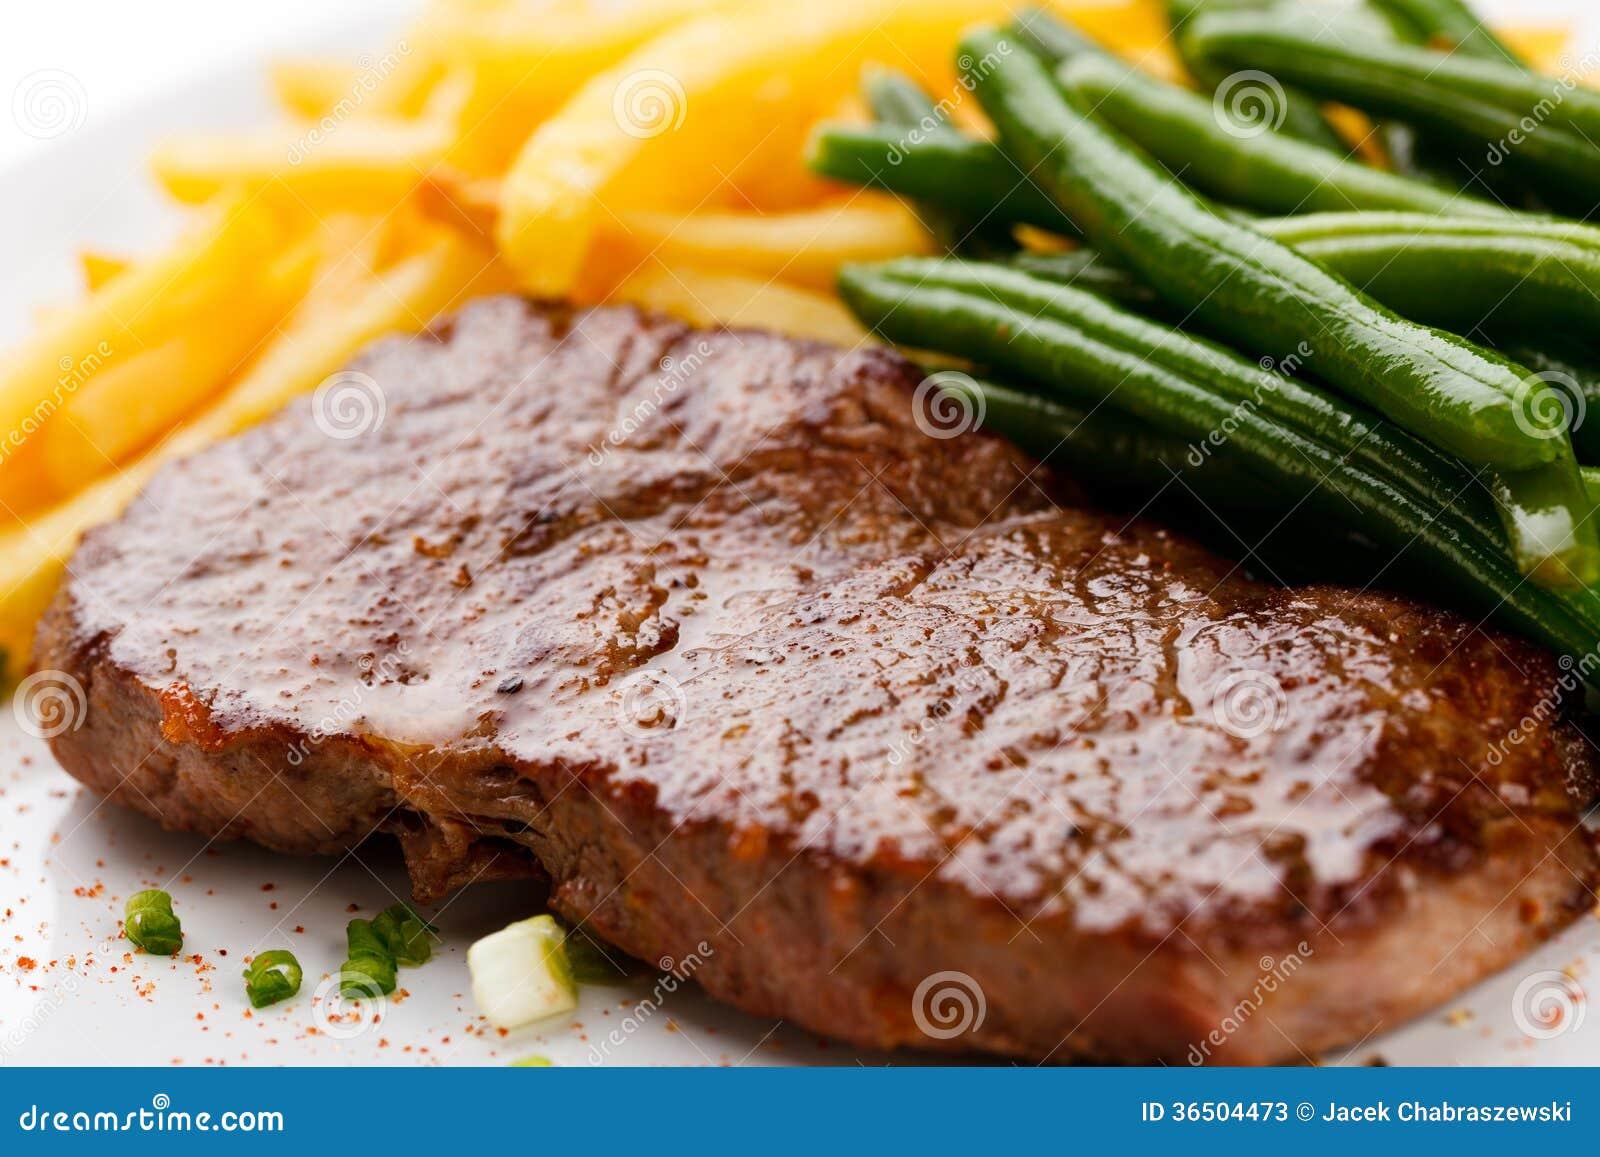 Bifteck grillé, pommes frites et haricot vert